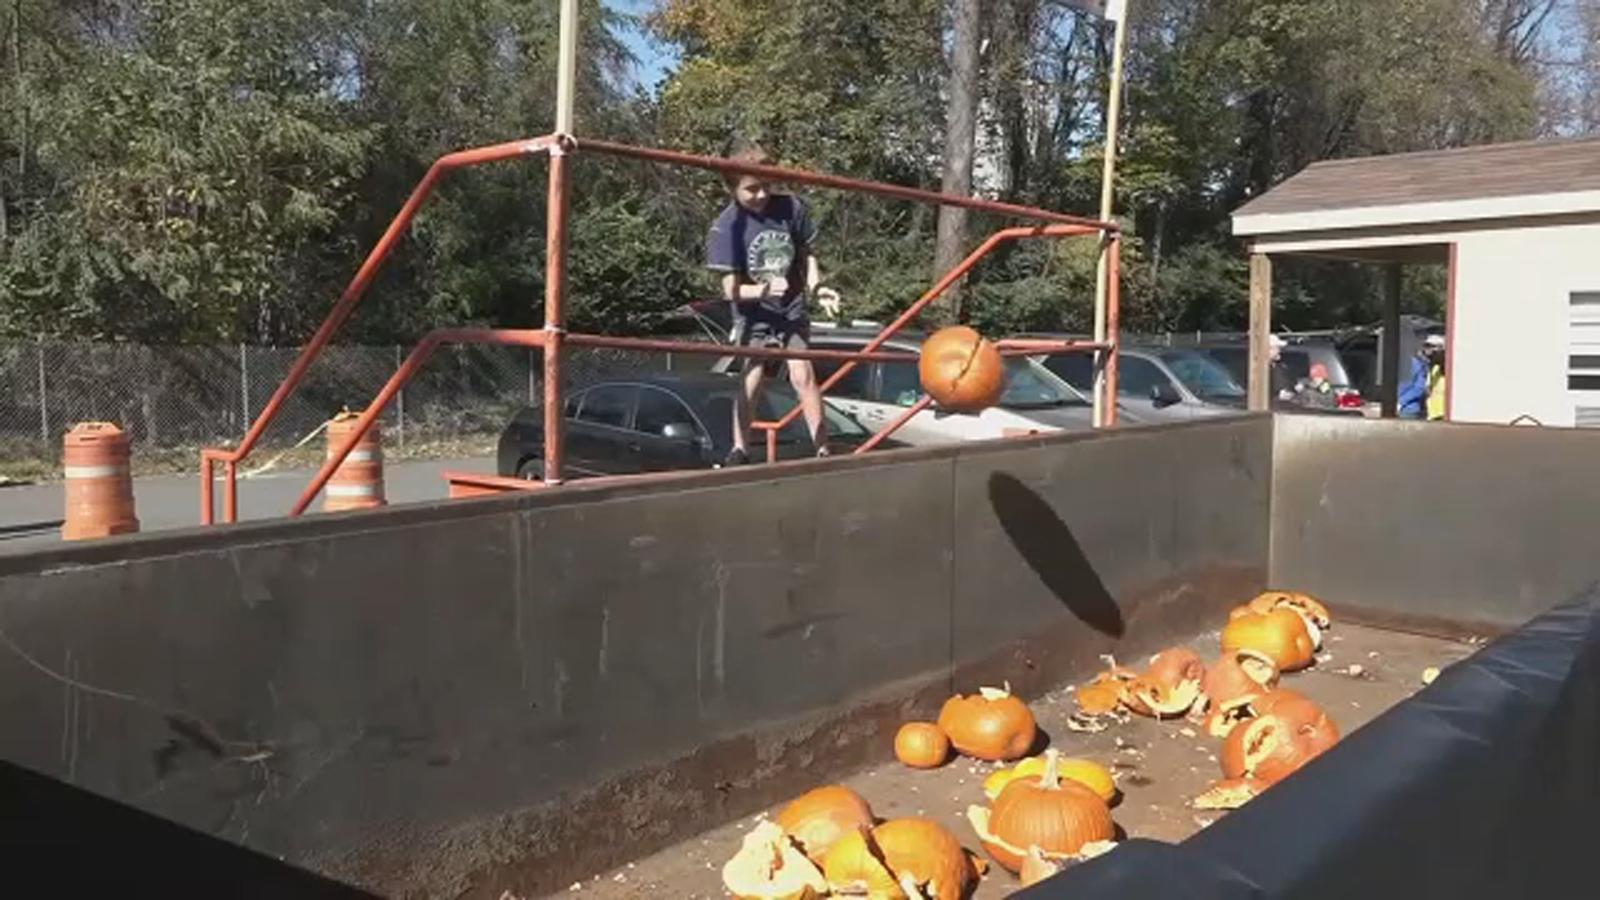 New York City park hosts pumpkin smashing festival